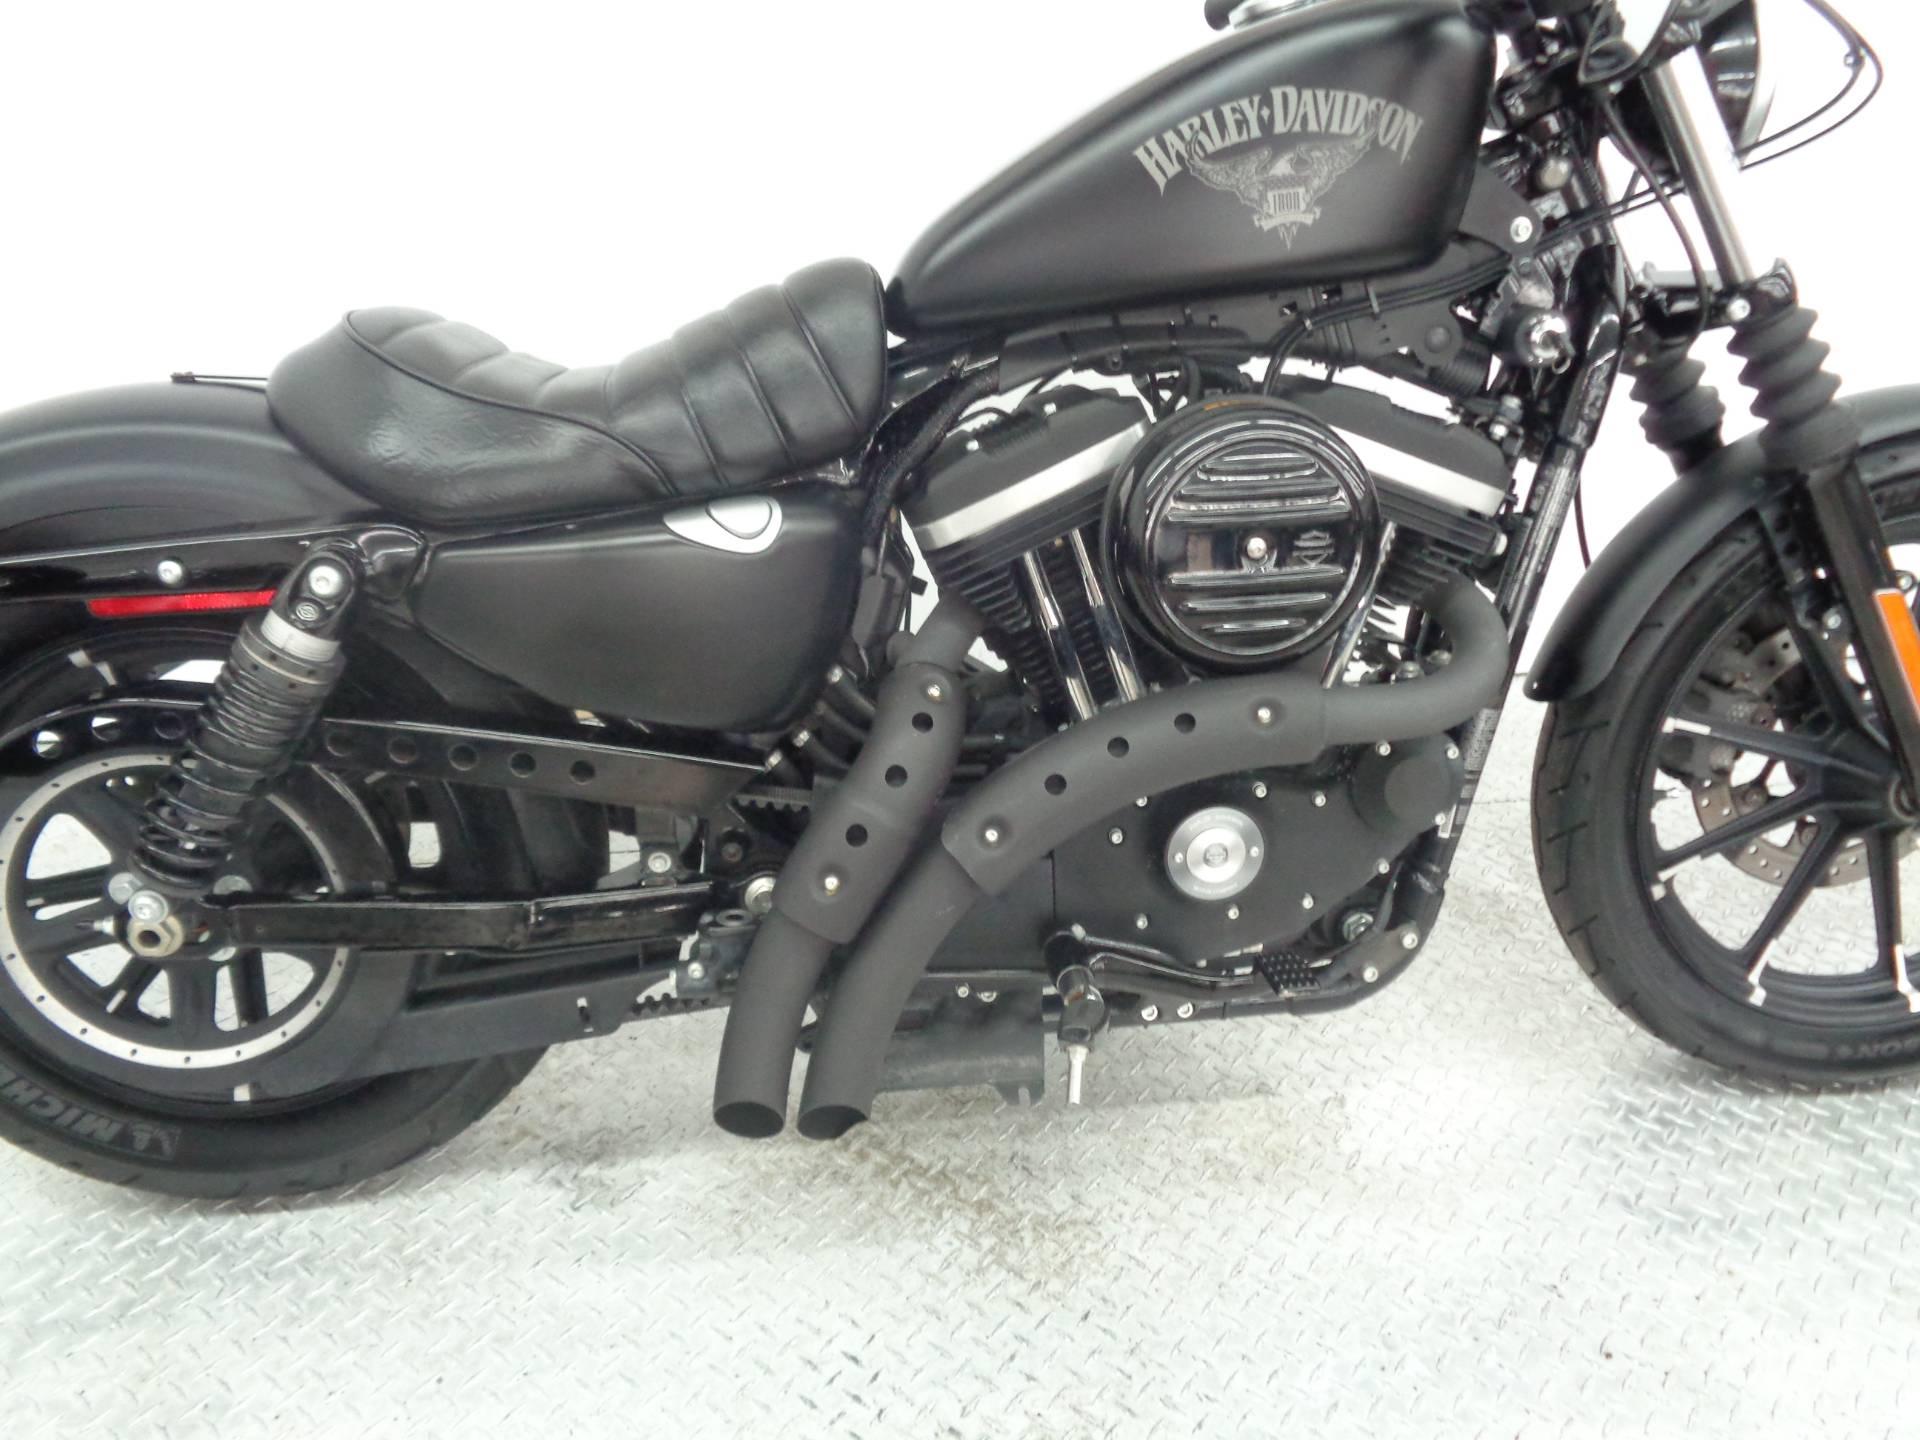 2016 Harley-Davidson Iron 883 10